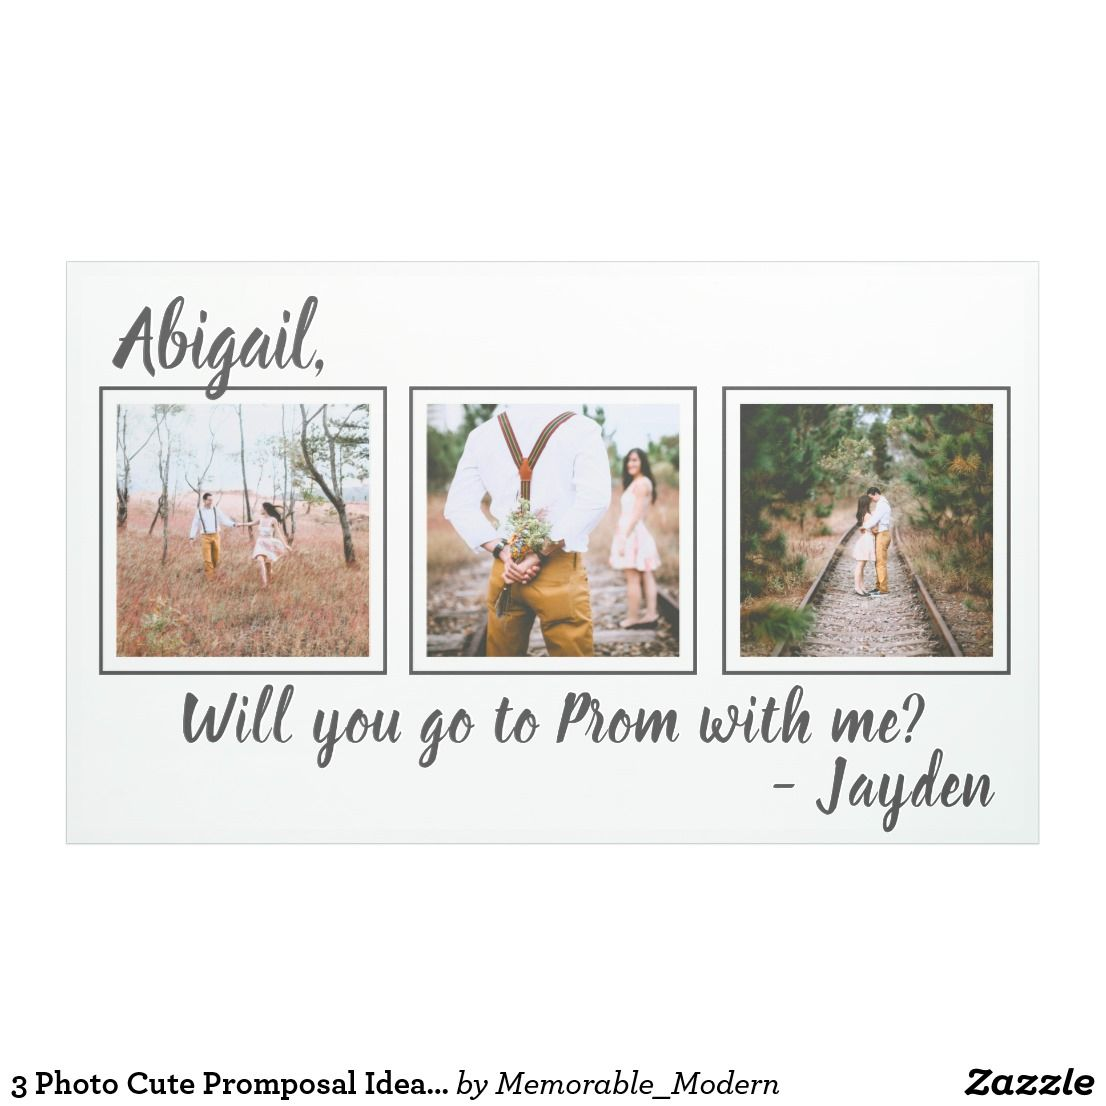 3 Photo Prom or HOCO Proposal Cute Promposal Idea Banner | Zazzle.com #promproposal